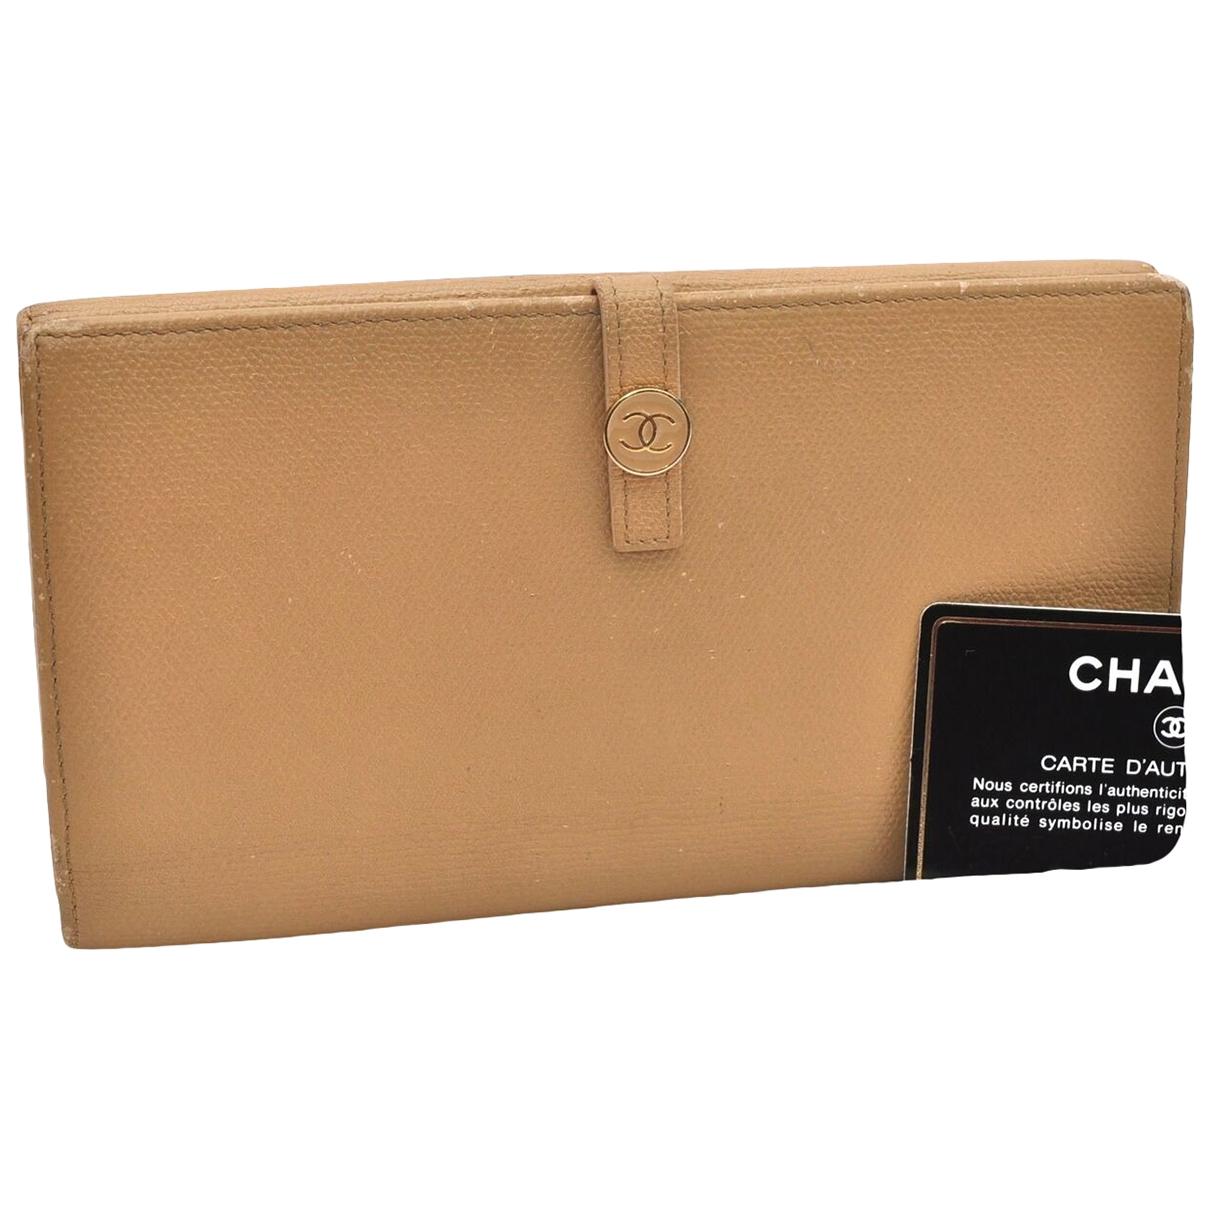 Chanel \N Portemonnaie in  Beige Leder